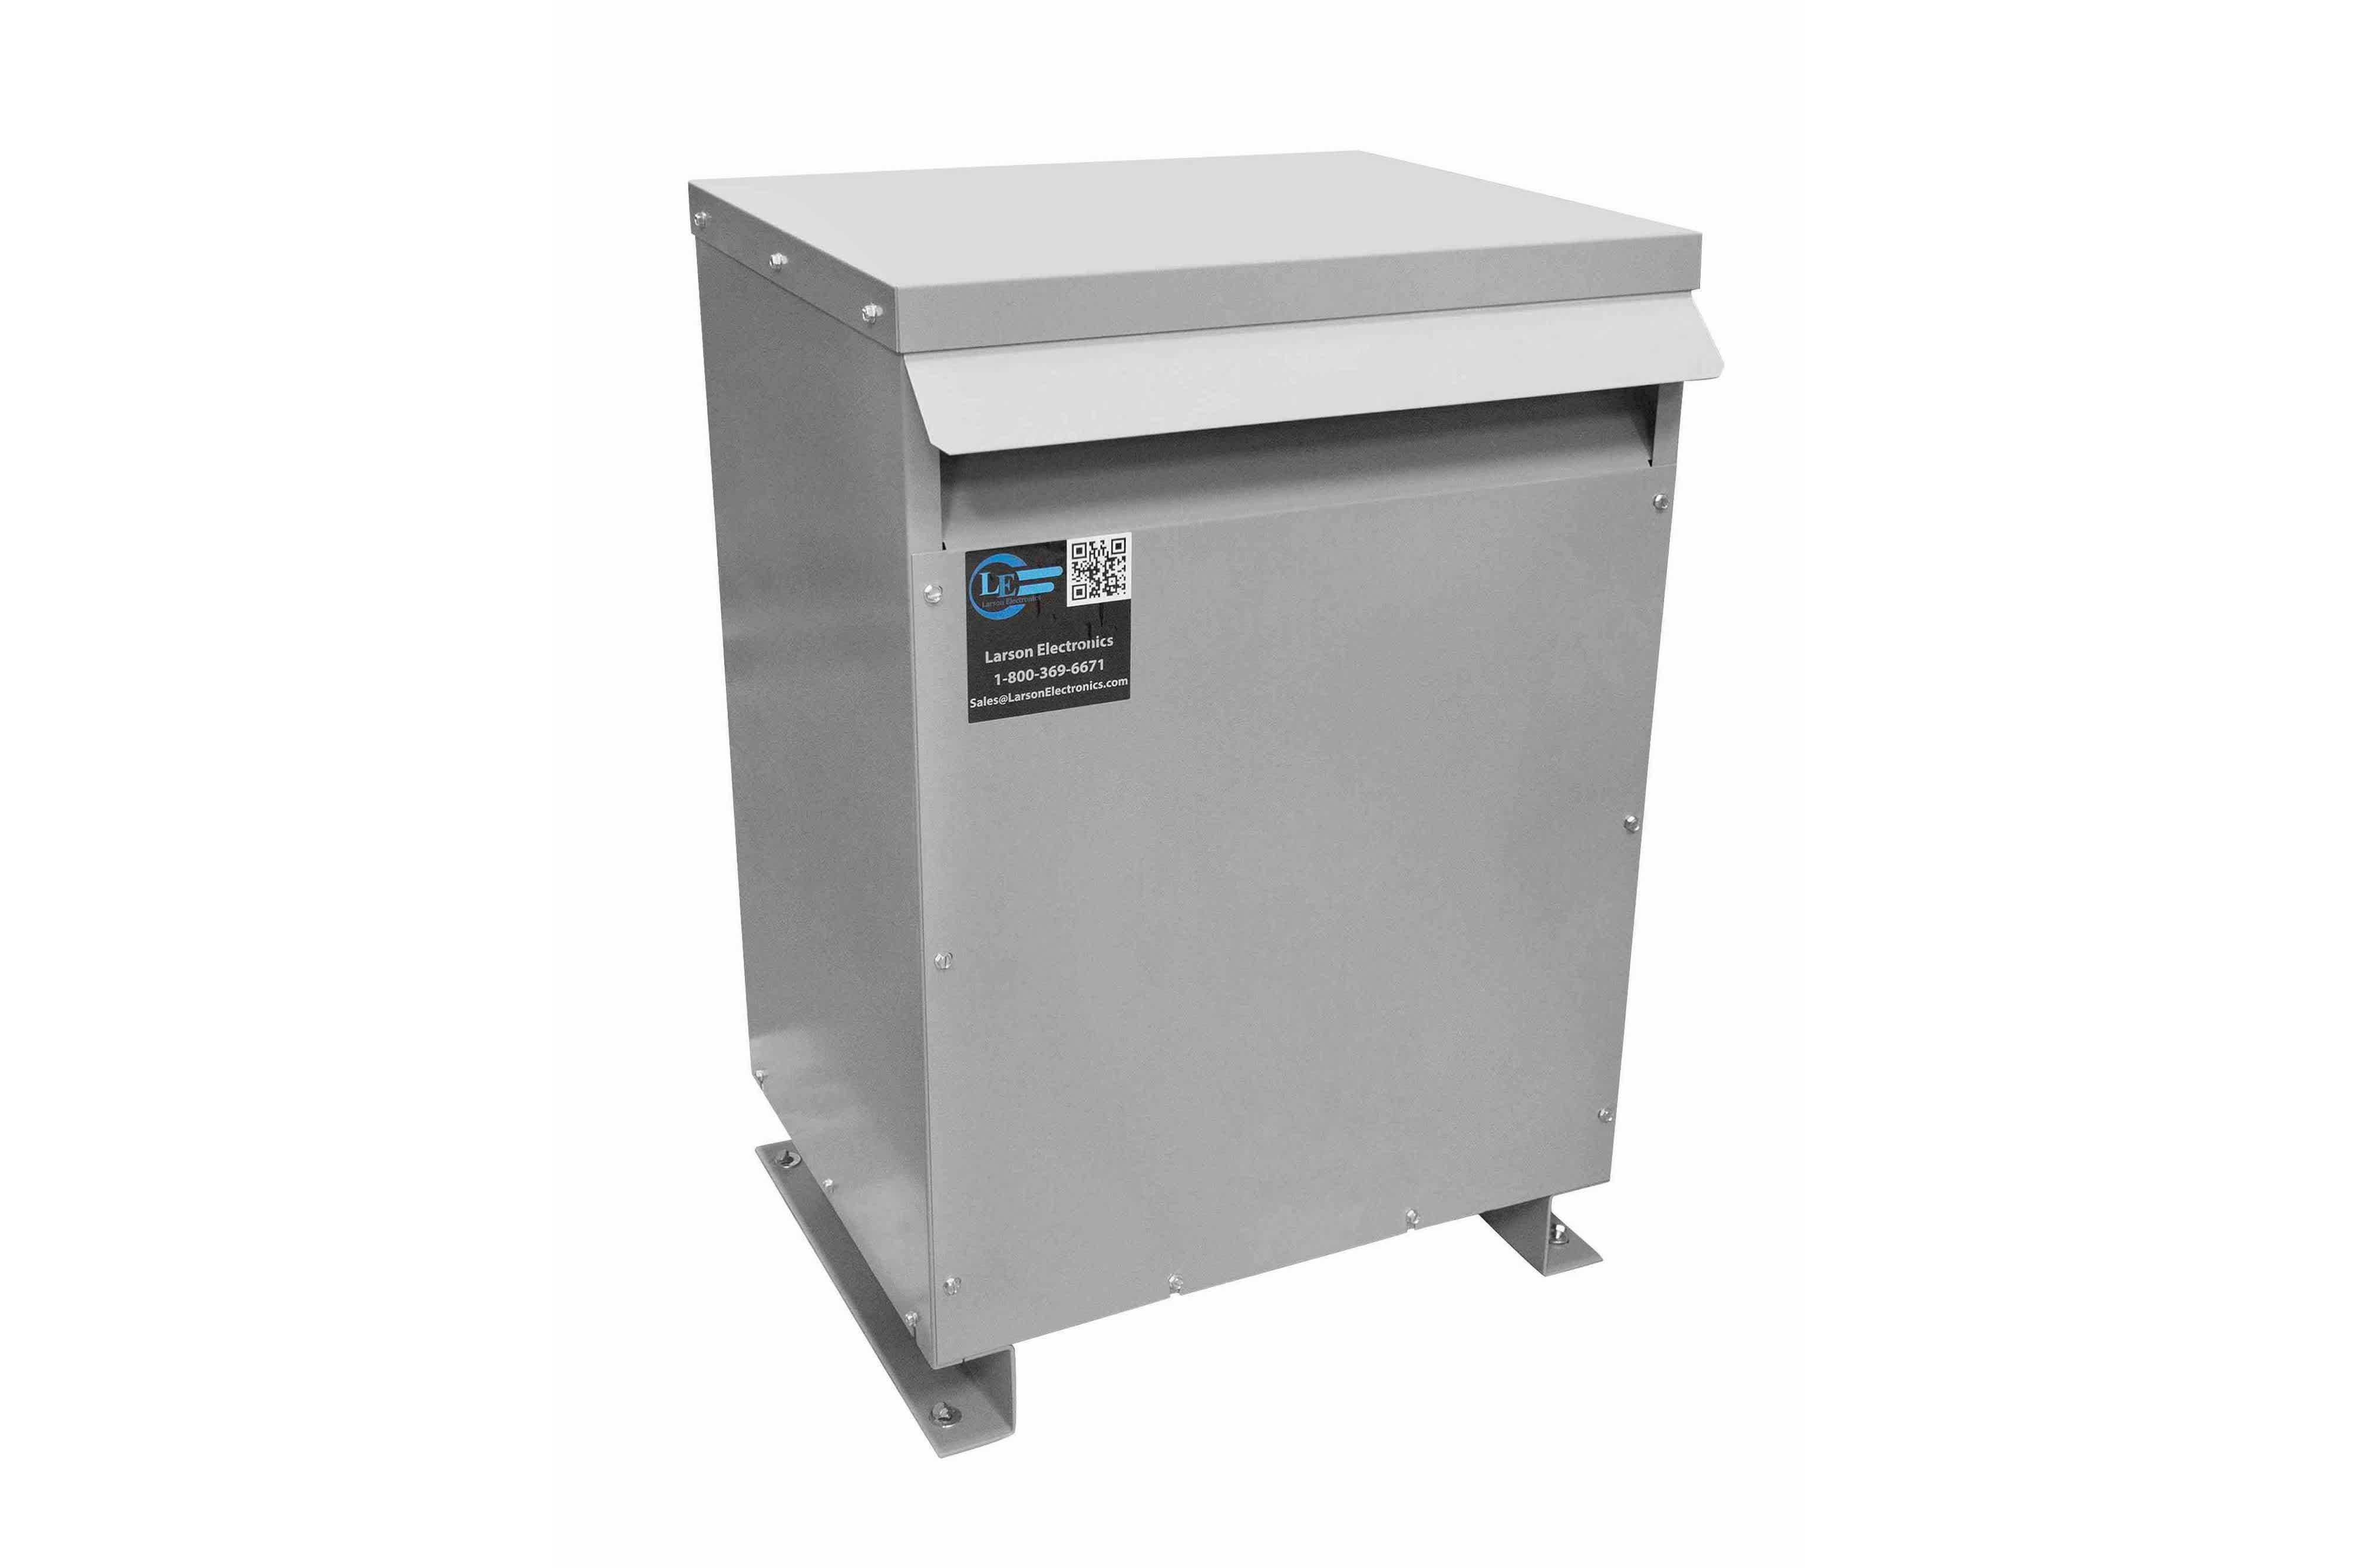 237.5 kVA 3PH Isolation Transformer, 208V Wye Primary, 400V Delta Secondary, N3R, Ventilated, 60 Hz